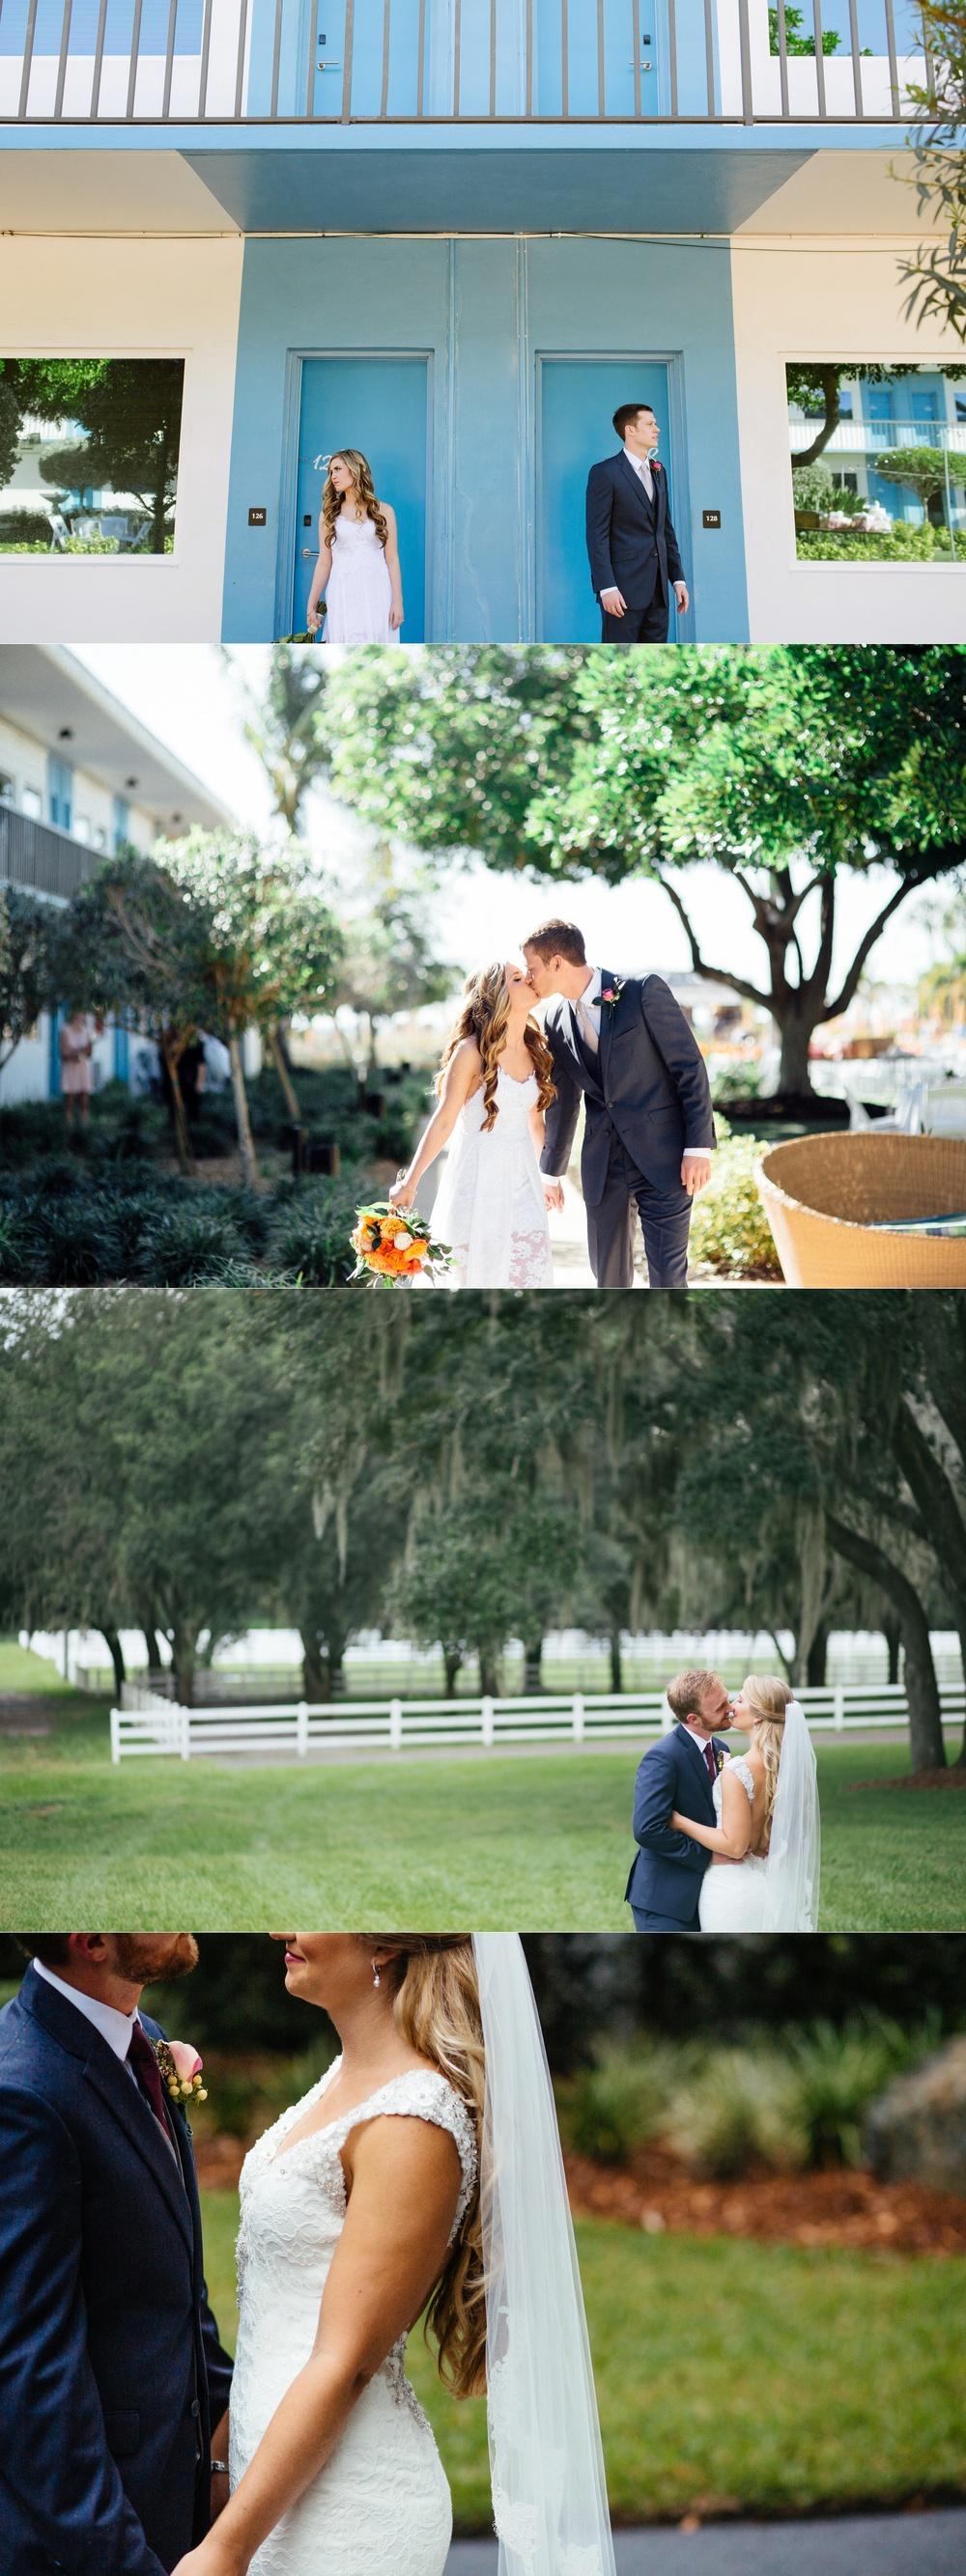 jake-and-katie-wedding-favorites-2015-49